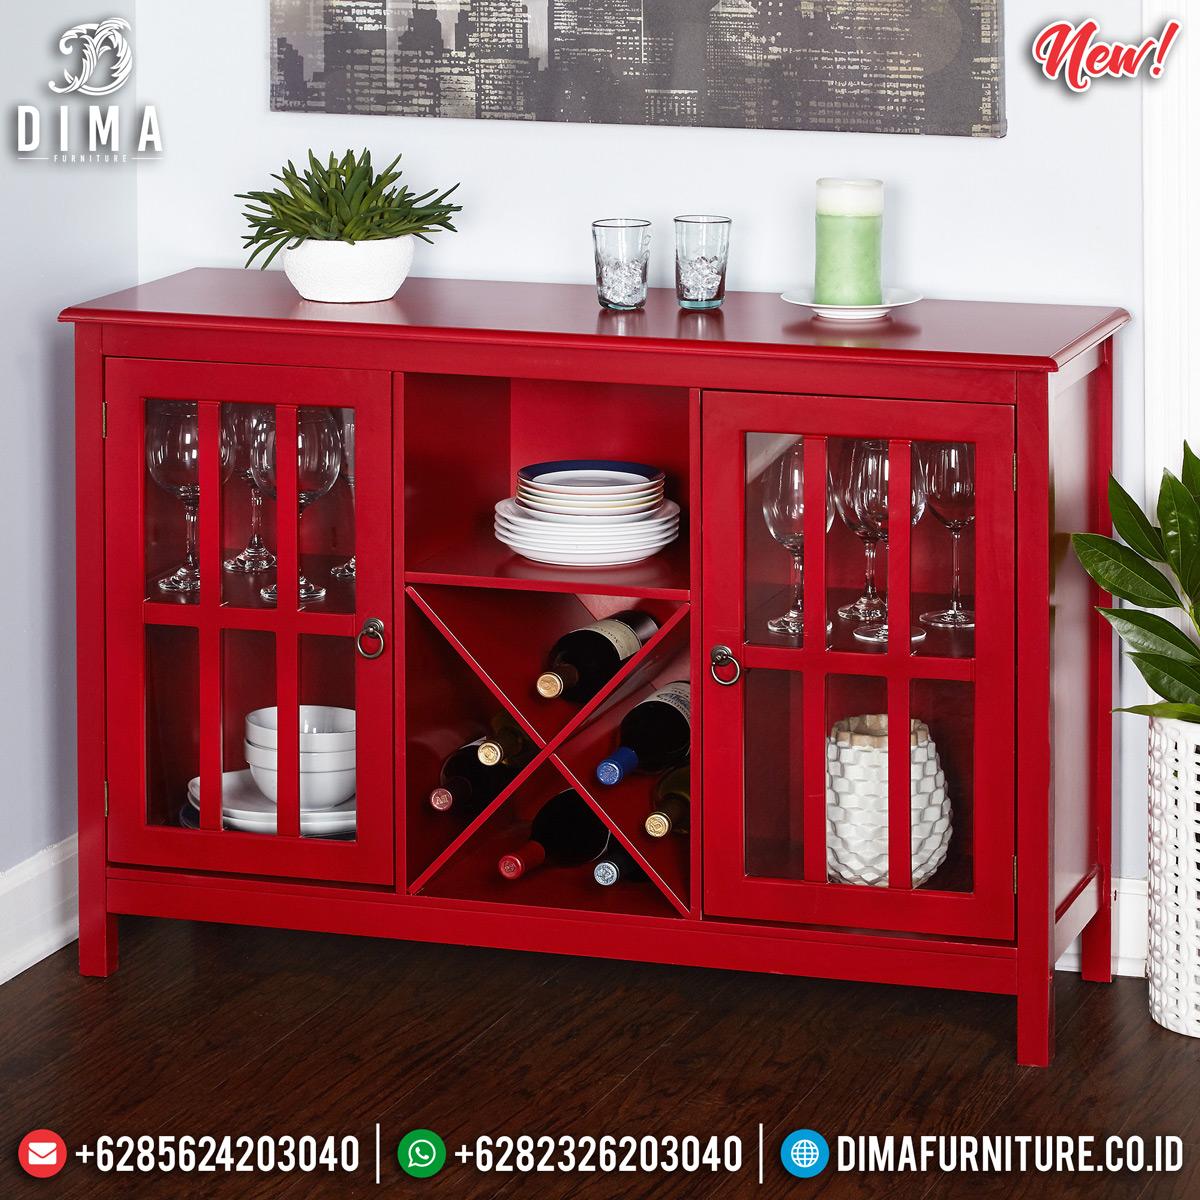 Meja Konsul Minimalis New Design Interior Kitchen Inspiring MMJ-0778